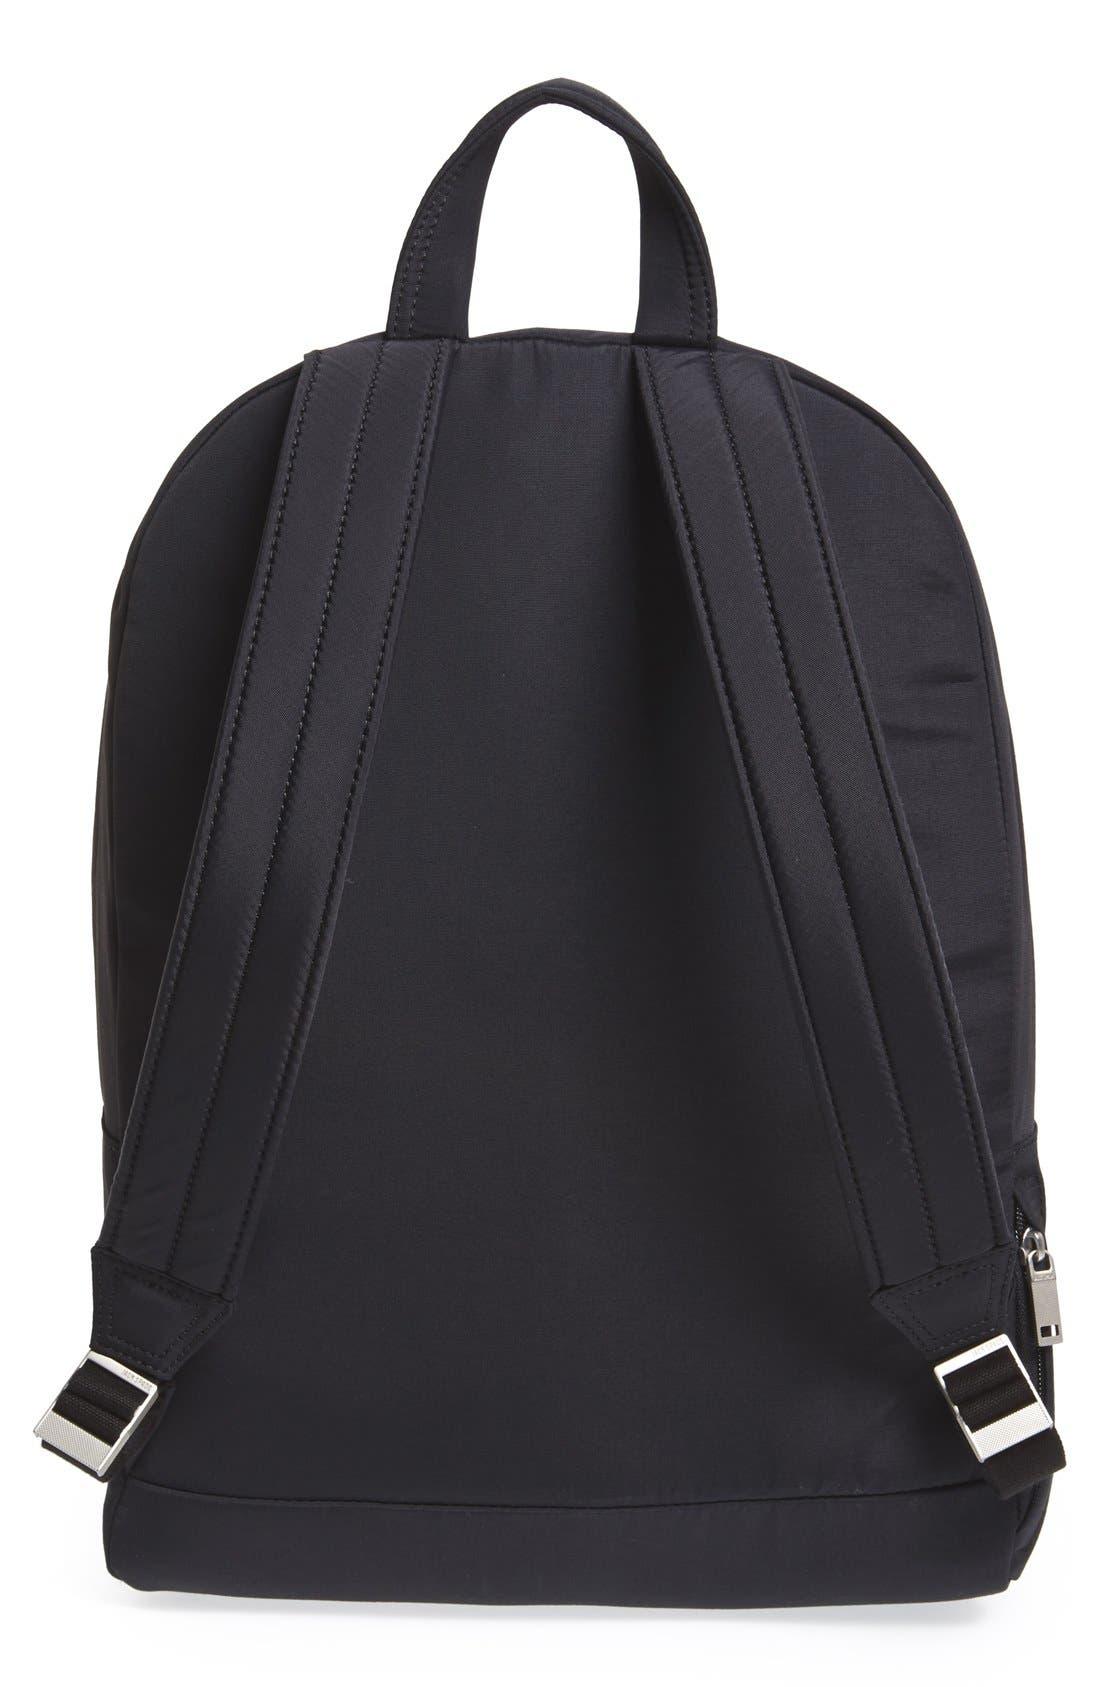 JACK SPADE,                             'Tech' Nylon Backpack,                             Alternate thumbnail 4, color,                             001